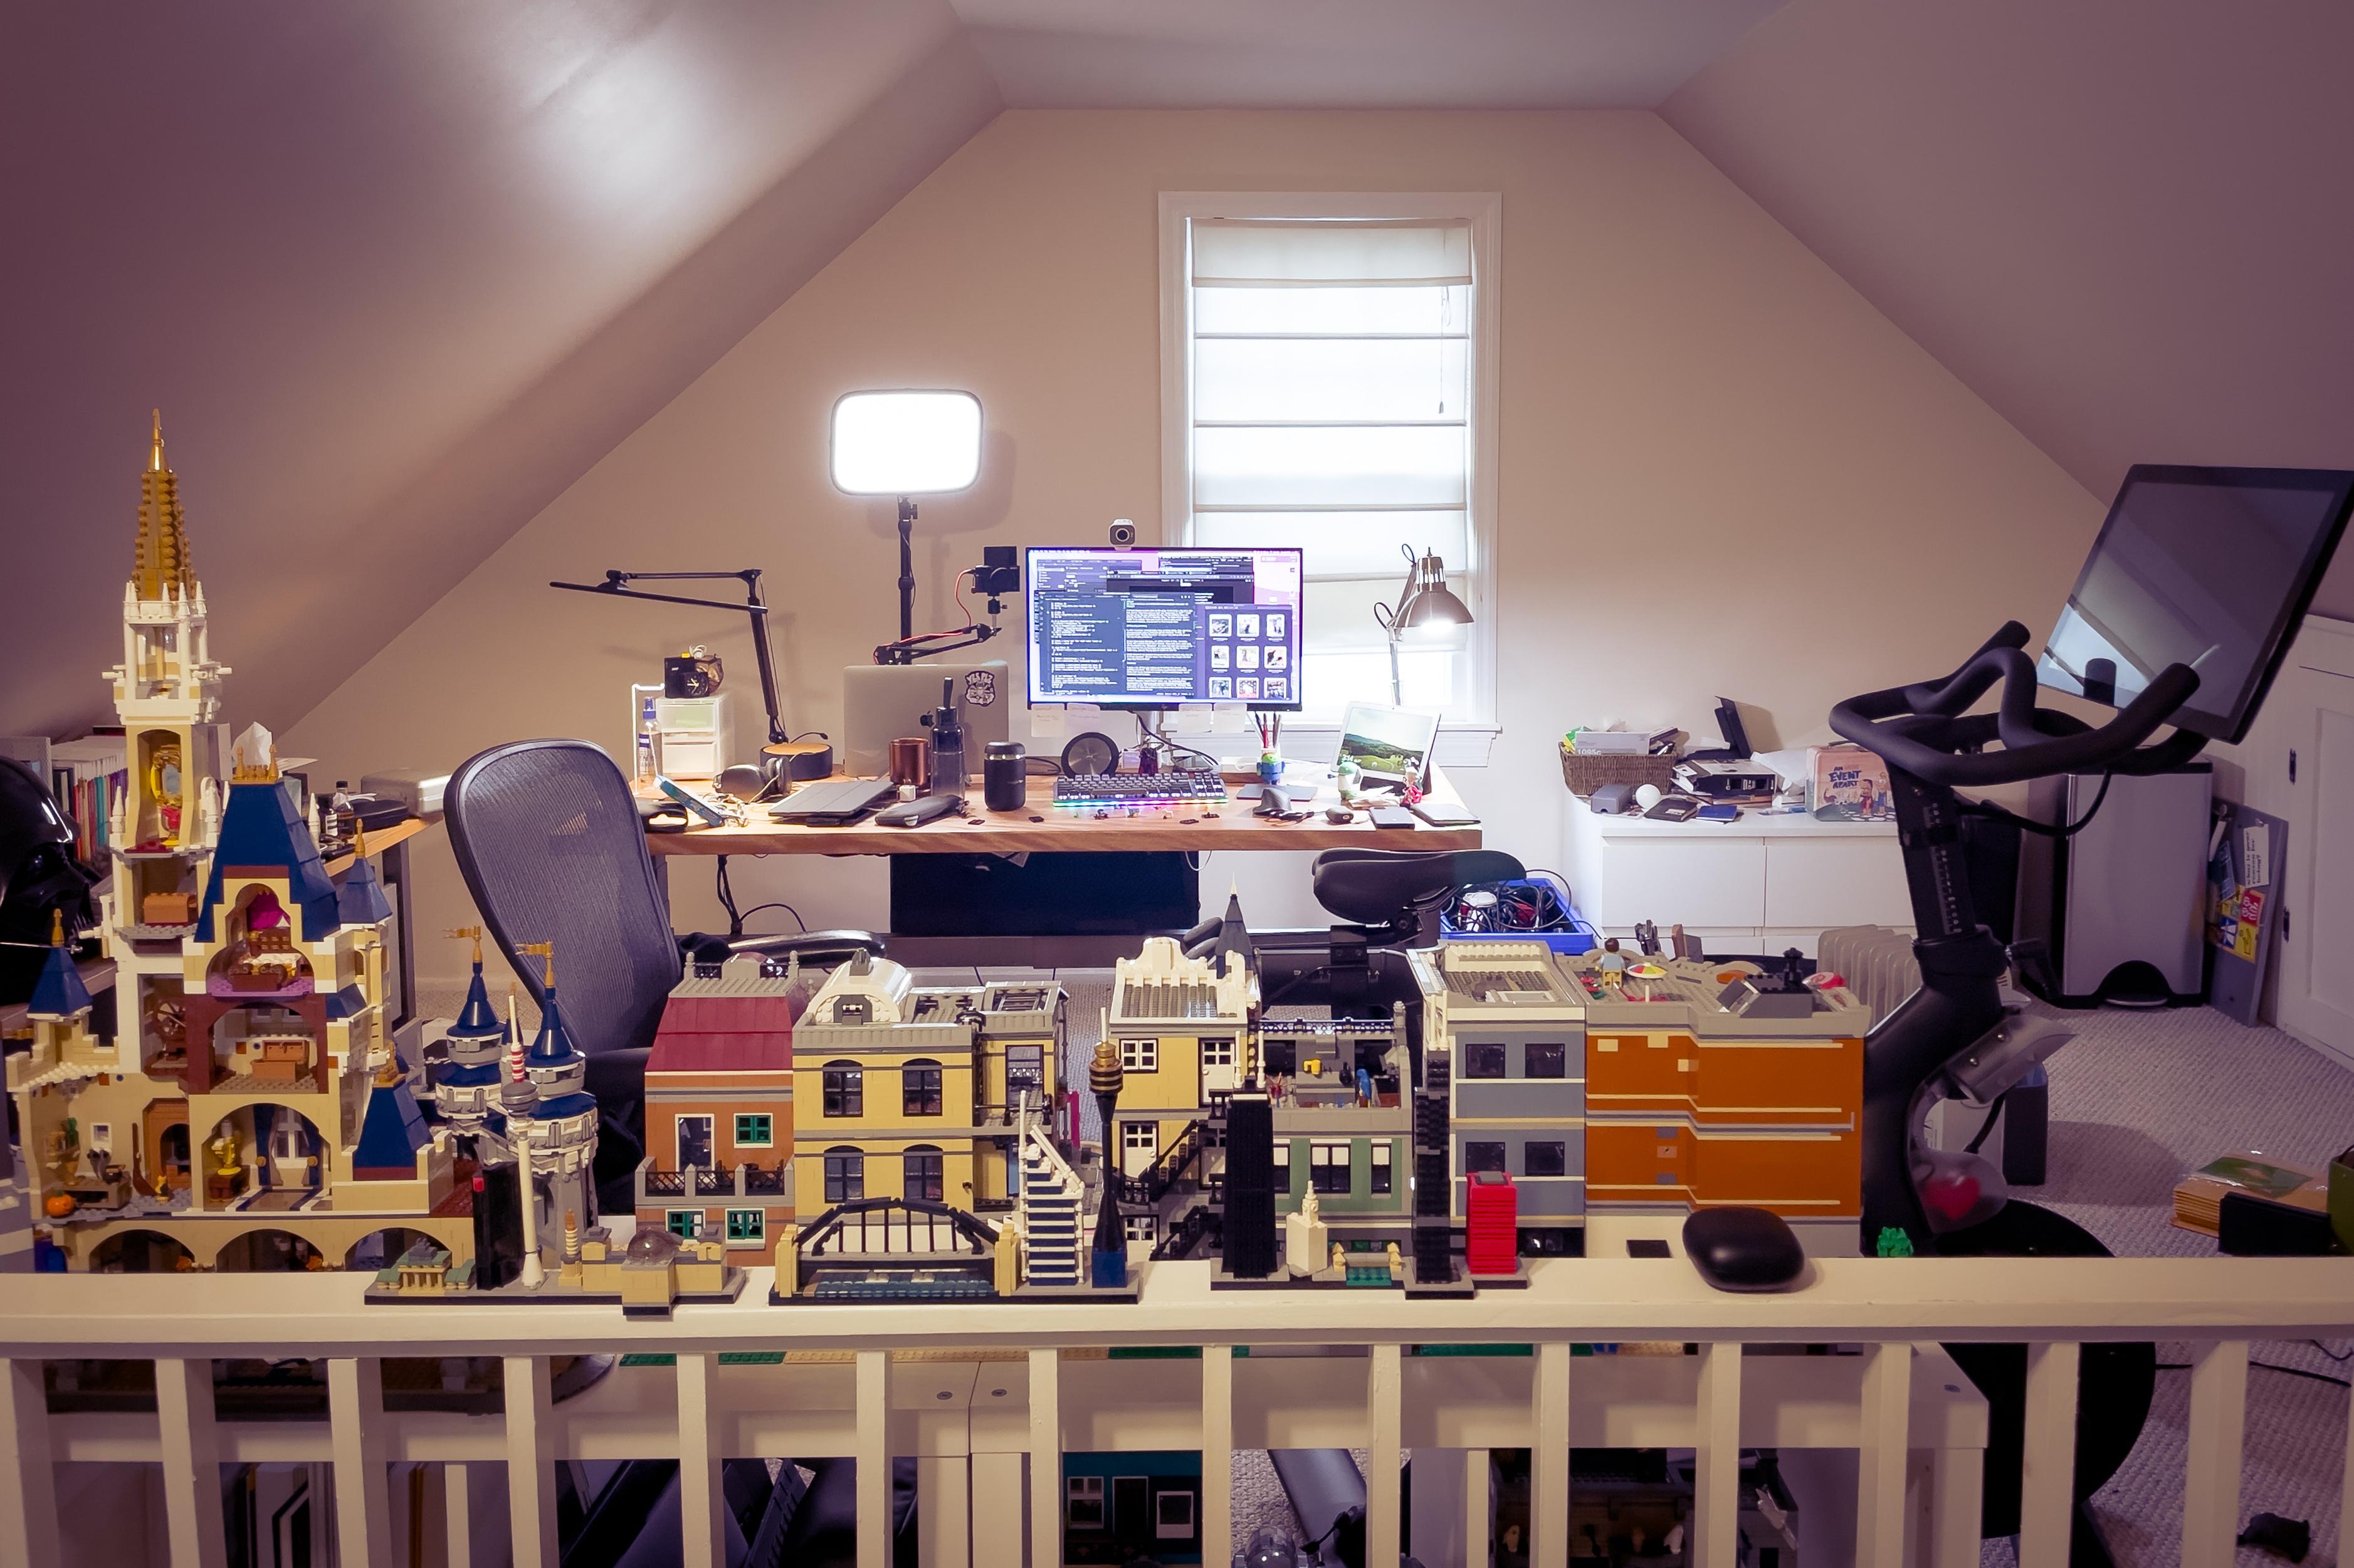 Desk, Peloton bike, and Lego sets